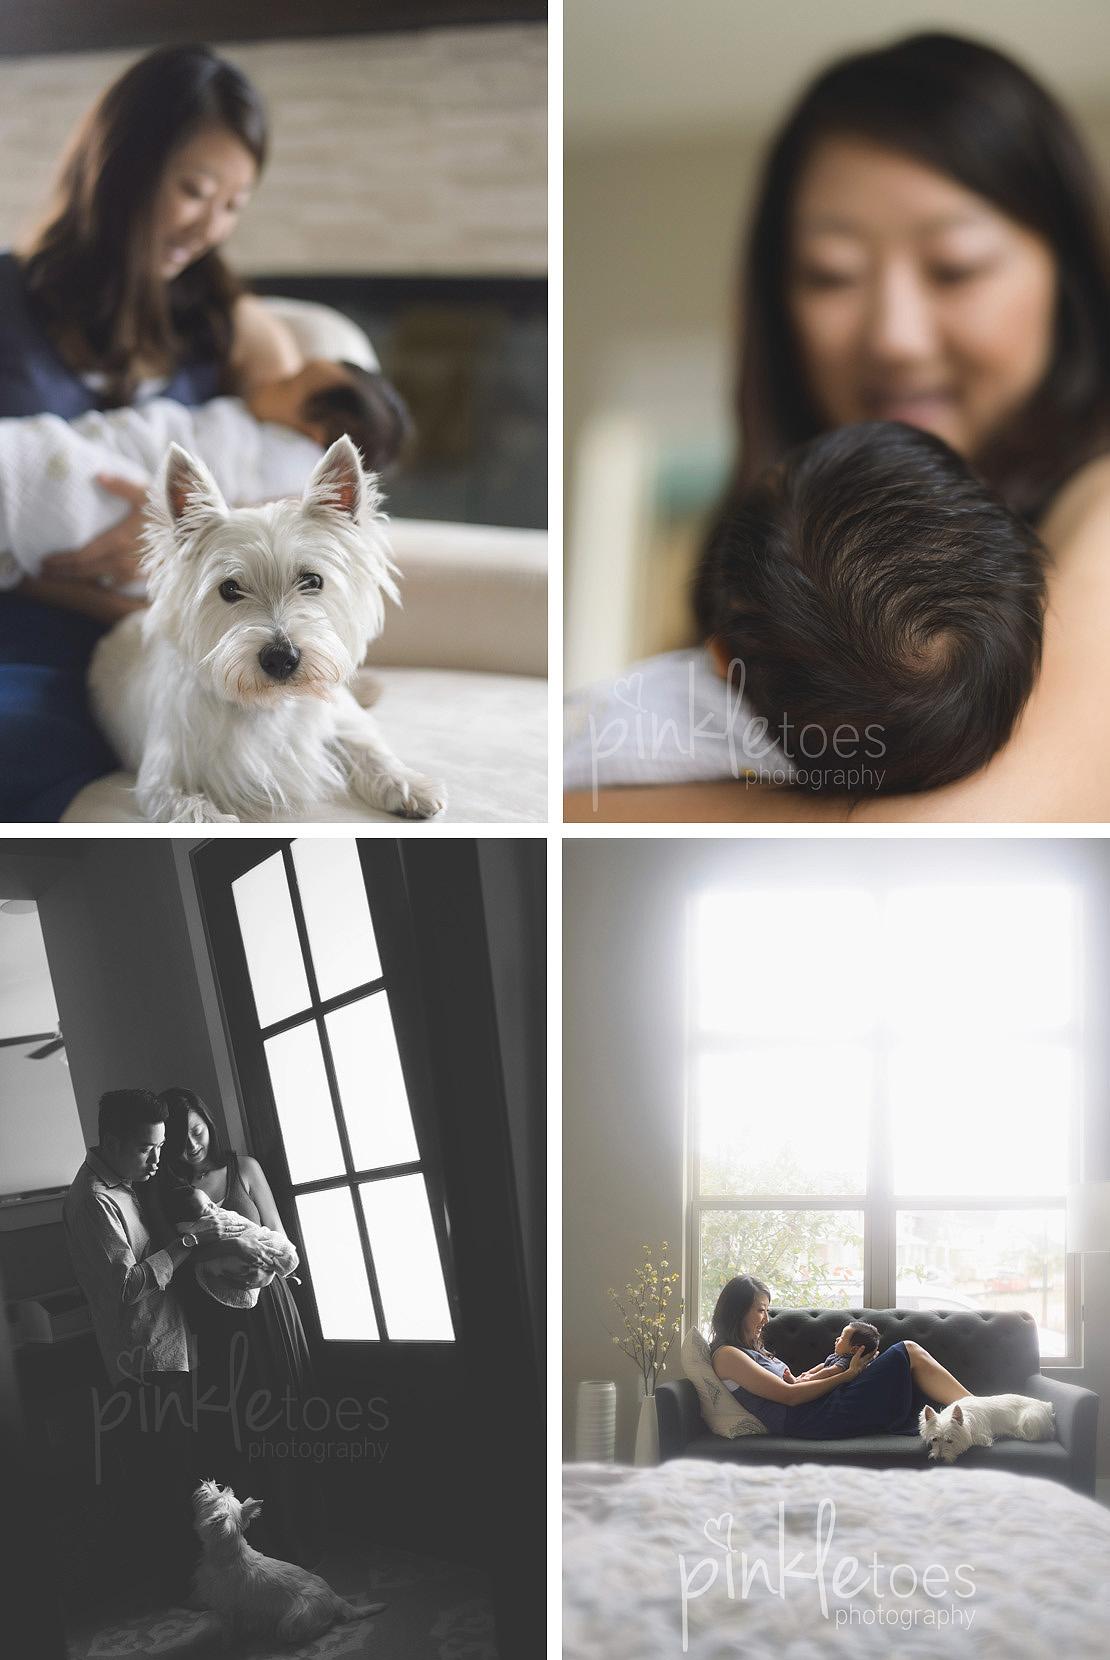 austin-natural-lifestyle-newborn-baby-photography-08a